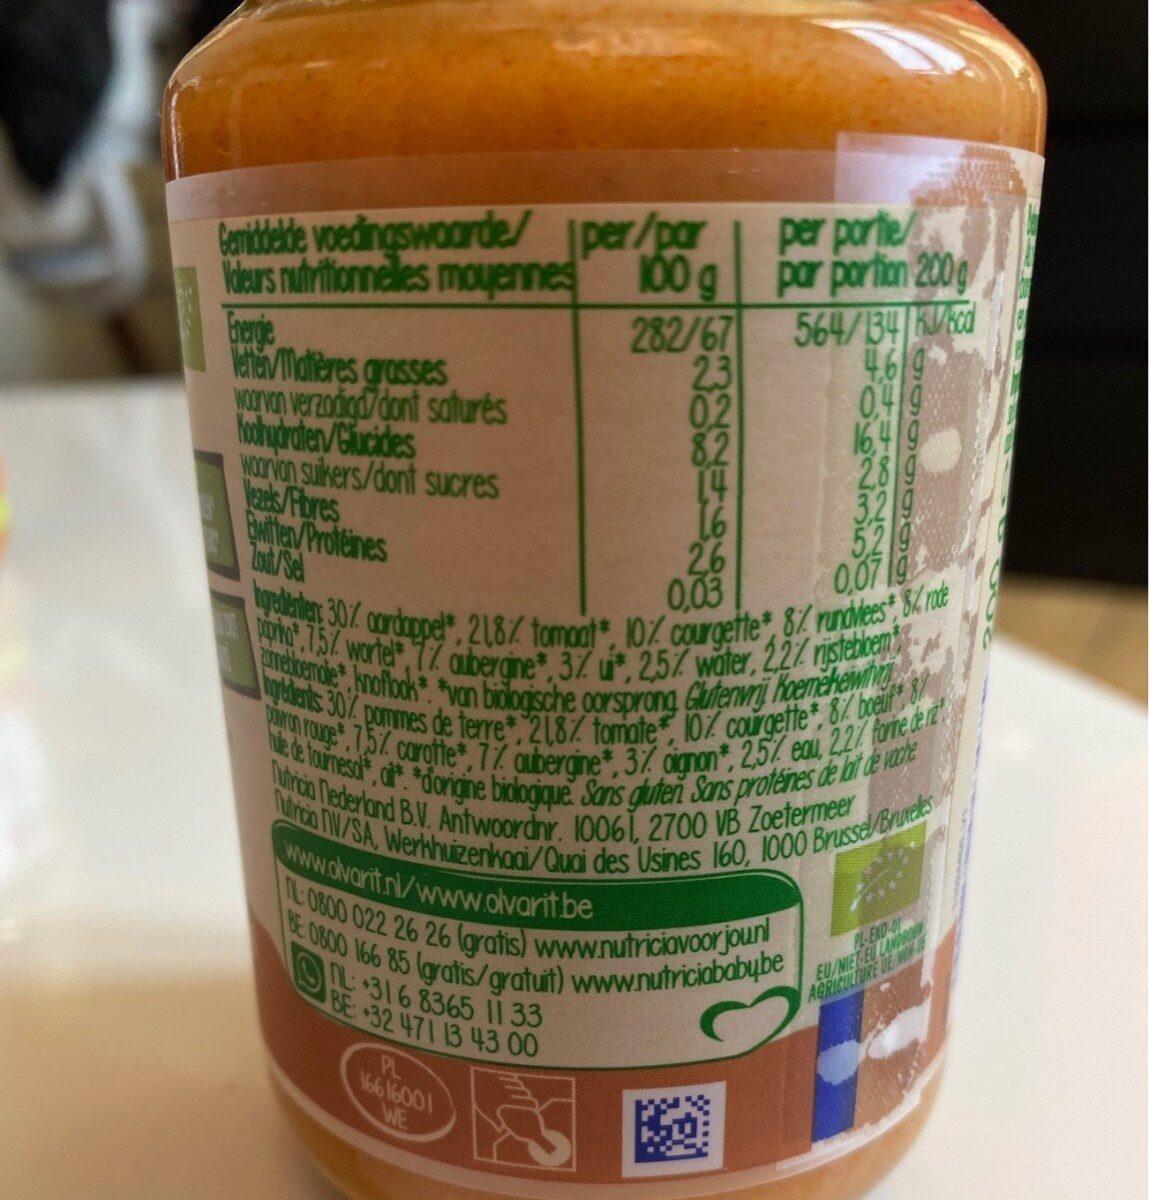 Olvarit Bio - Informations nutritionnelles - fr